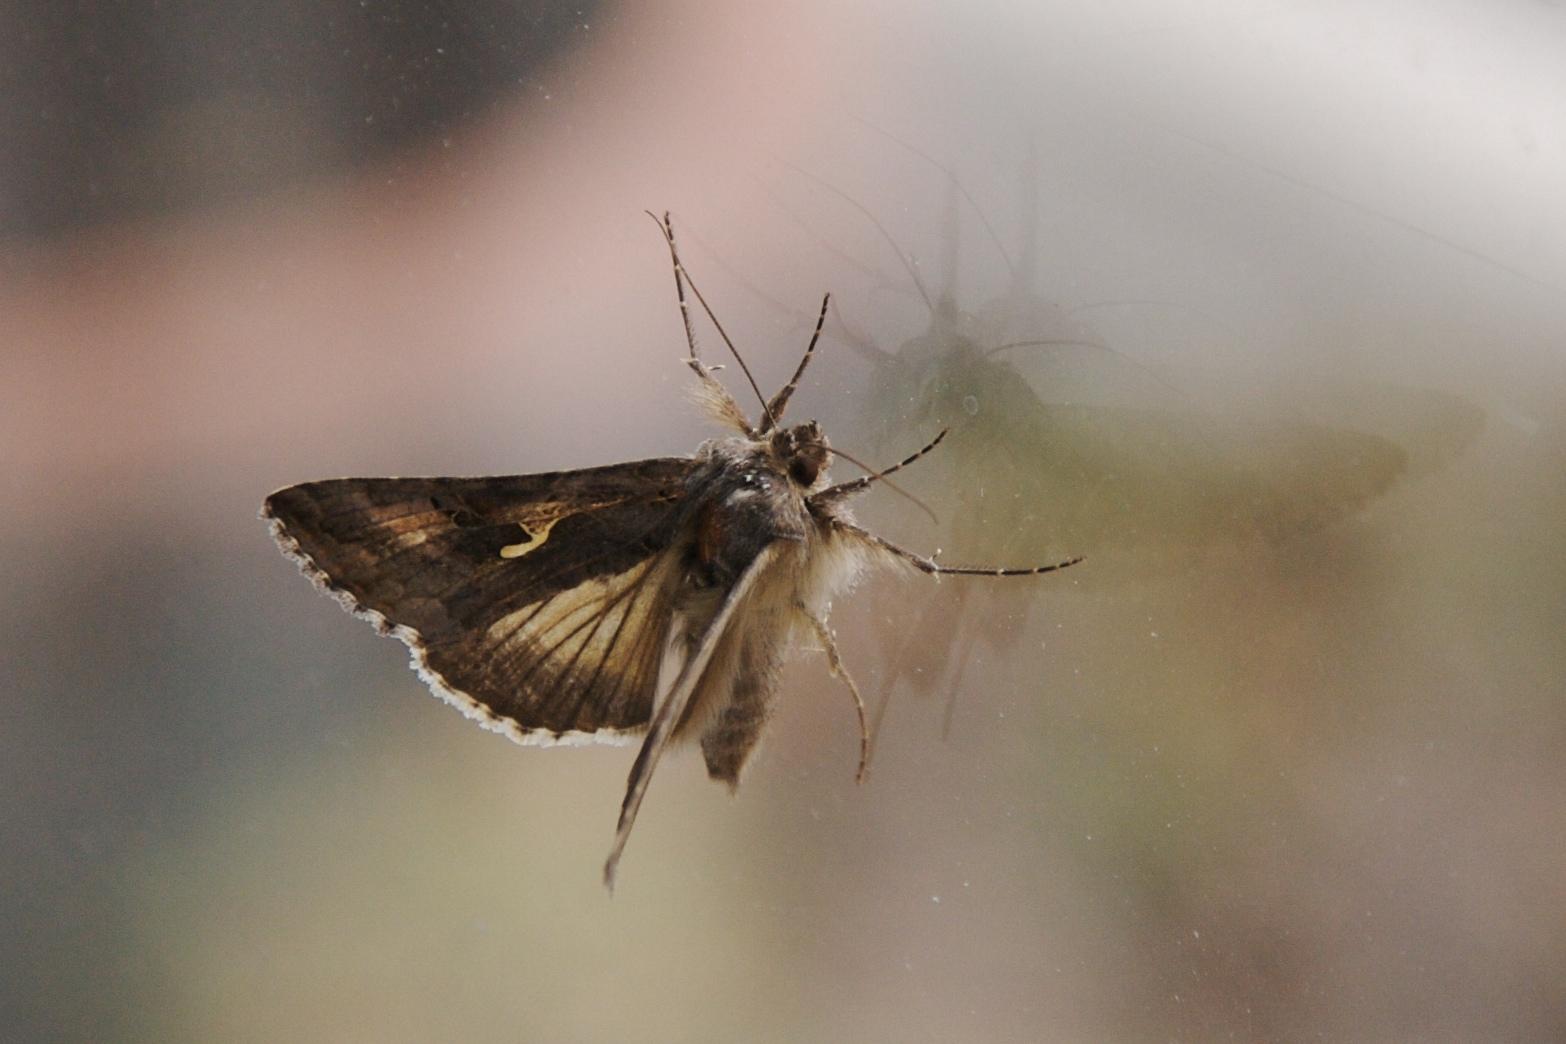 Moth, probably